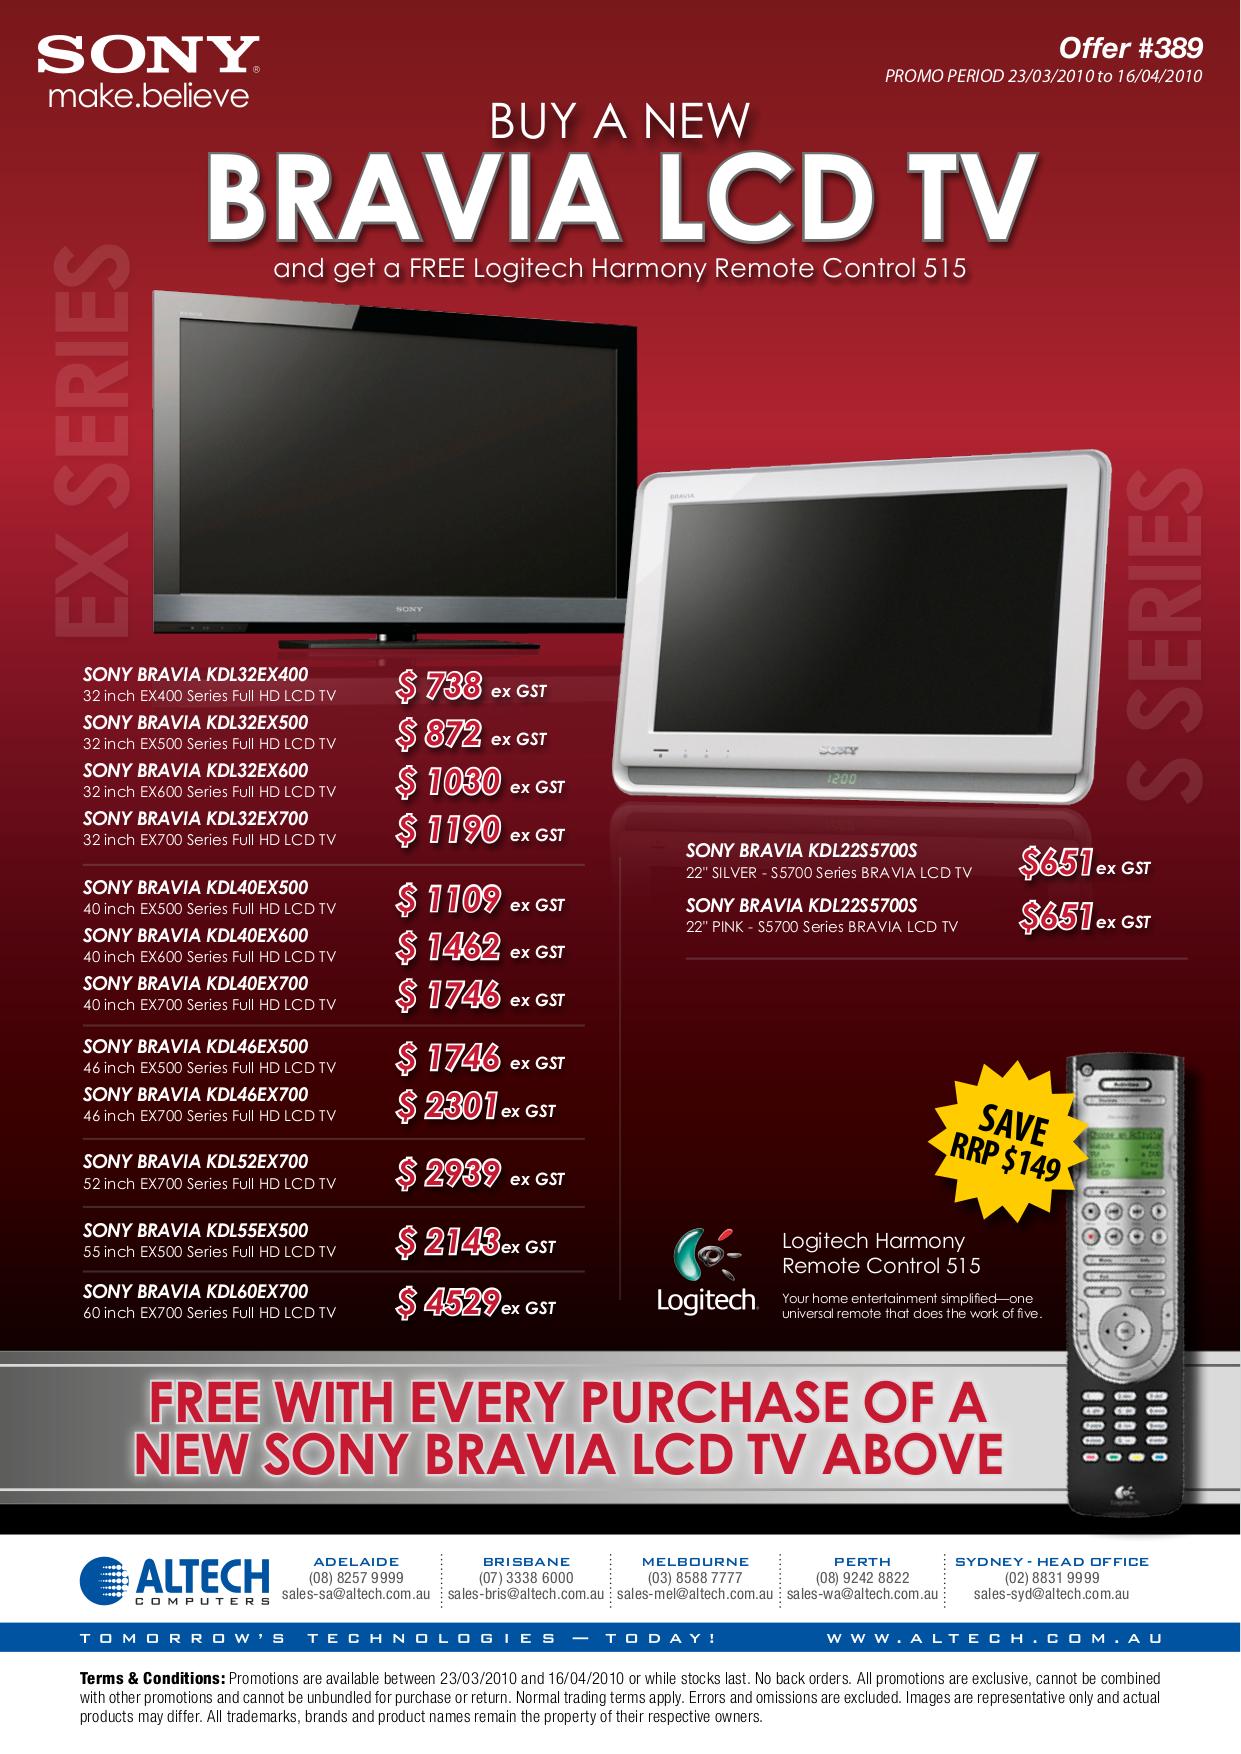 download free pdf for sony bravia kdl 55ex500 tv manual rh umlib com sony bravia kdl-55ex500 user manual sony kdl-55ex500 manual pdf